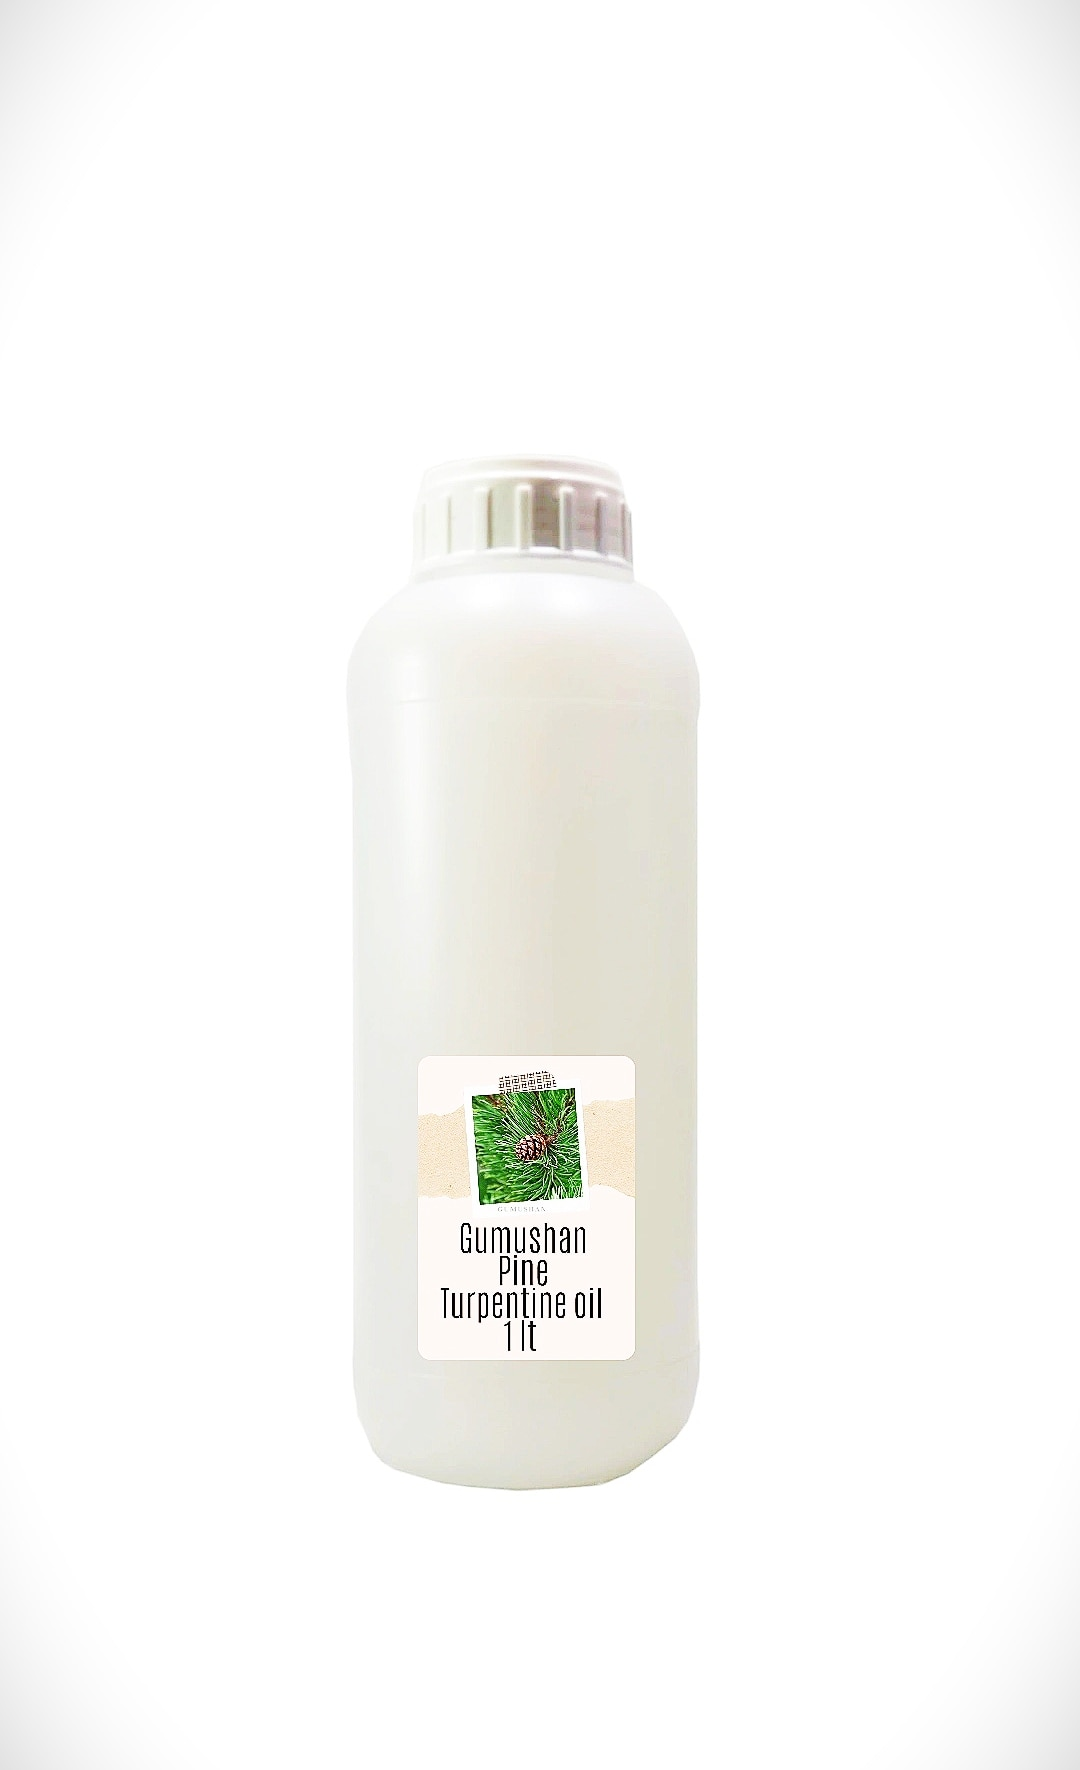 High quality pure Pine Turpentine Oil 1 liter 34 fl oz 1000ml